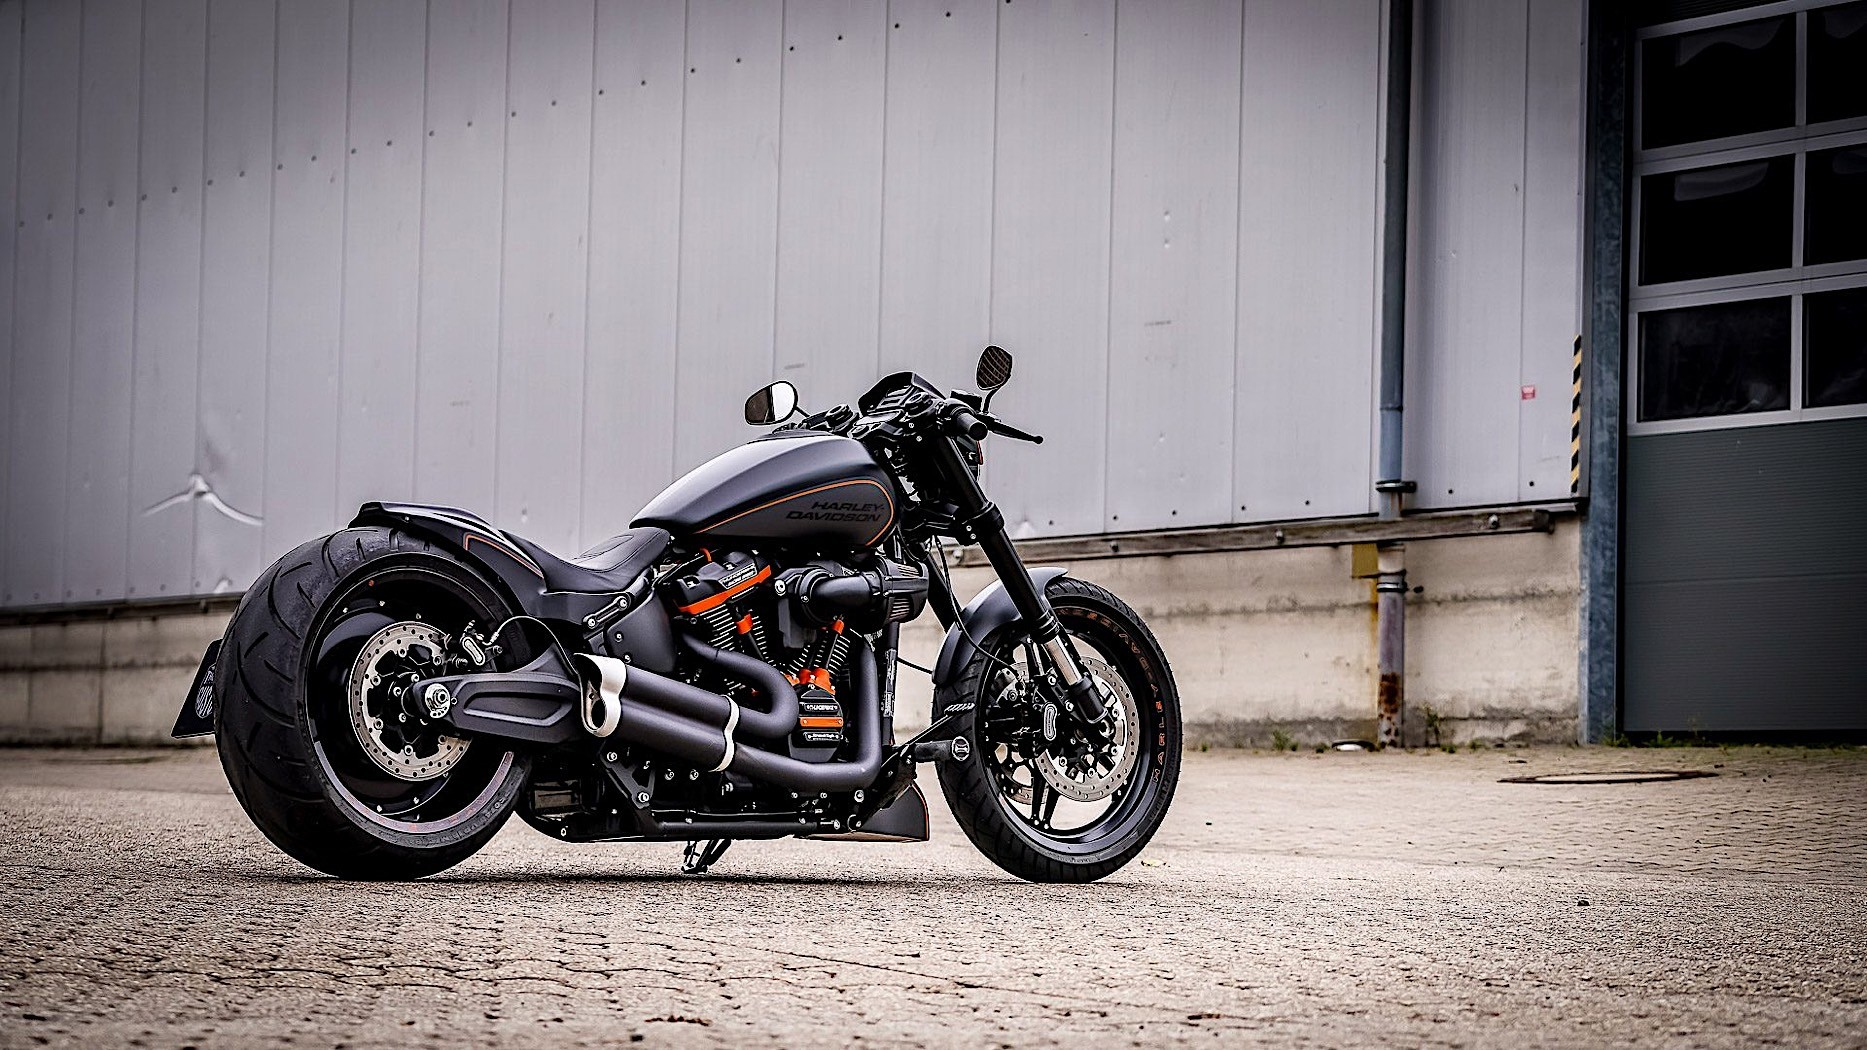 Harley Davidson Black Rebel Is a Full Custom Thunderbike ...